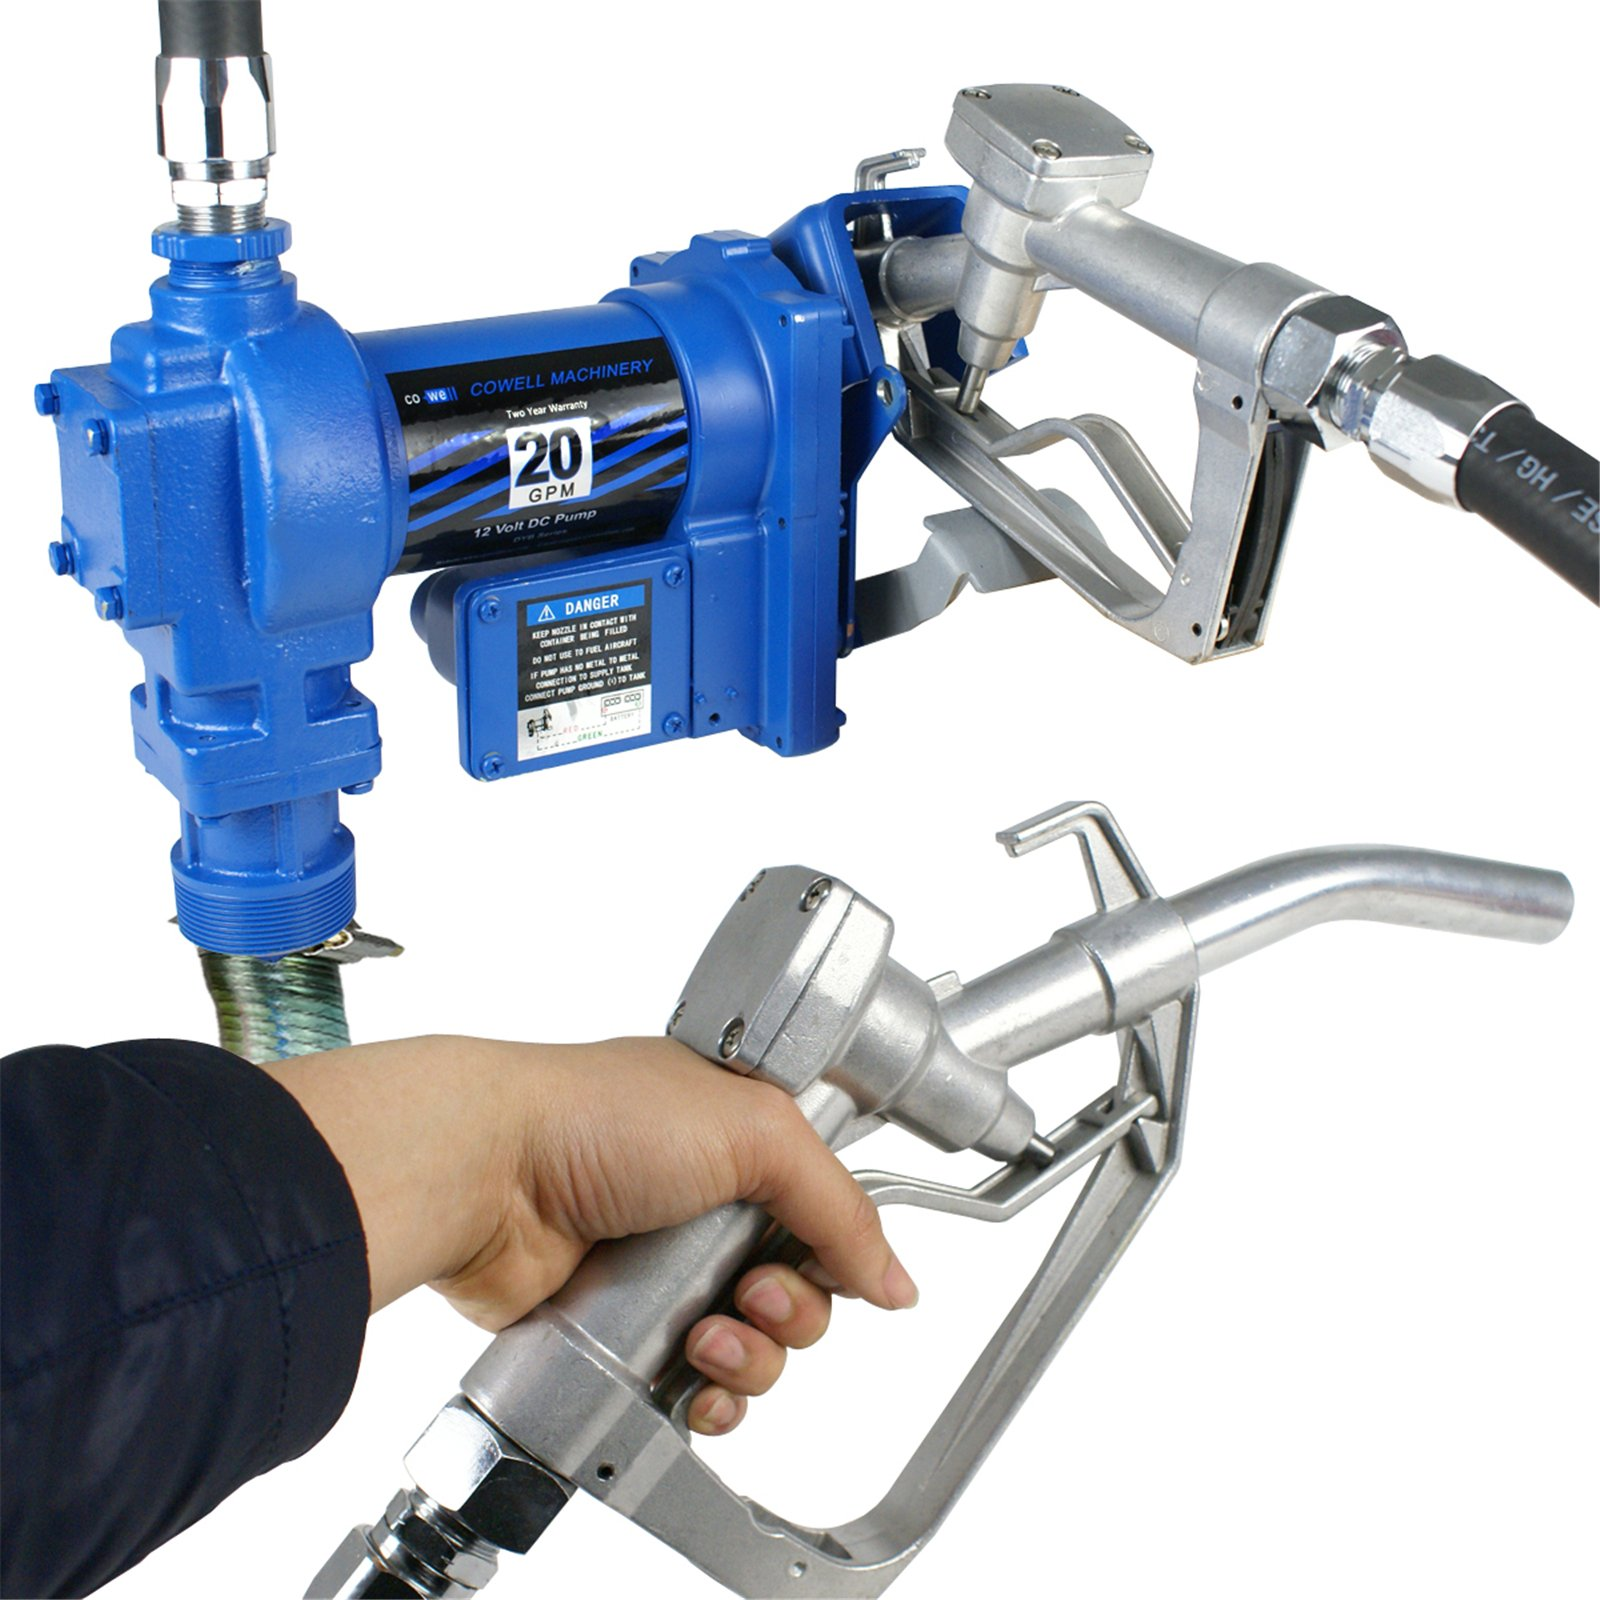 F2C 12 Volt 20GPM Electric Diesel Kerosene Gasoline Fuel Transfer Pump Fillrite Manual Nozzle Hose Kit … Blue by F2C (Image #1)